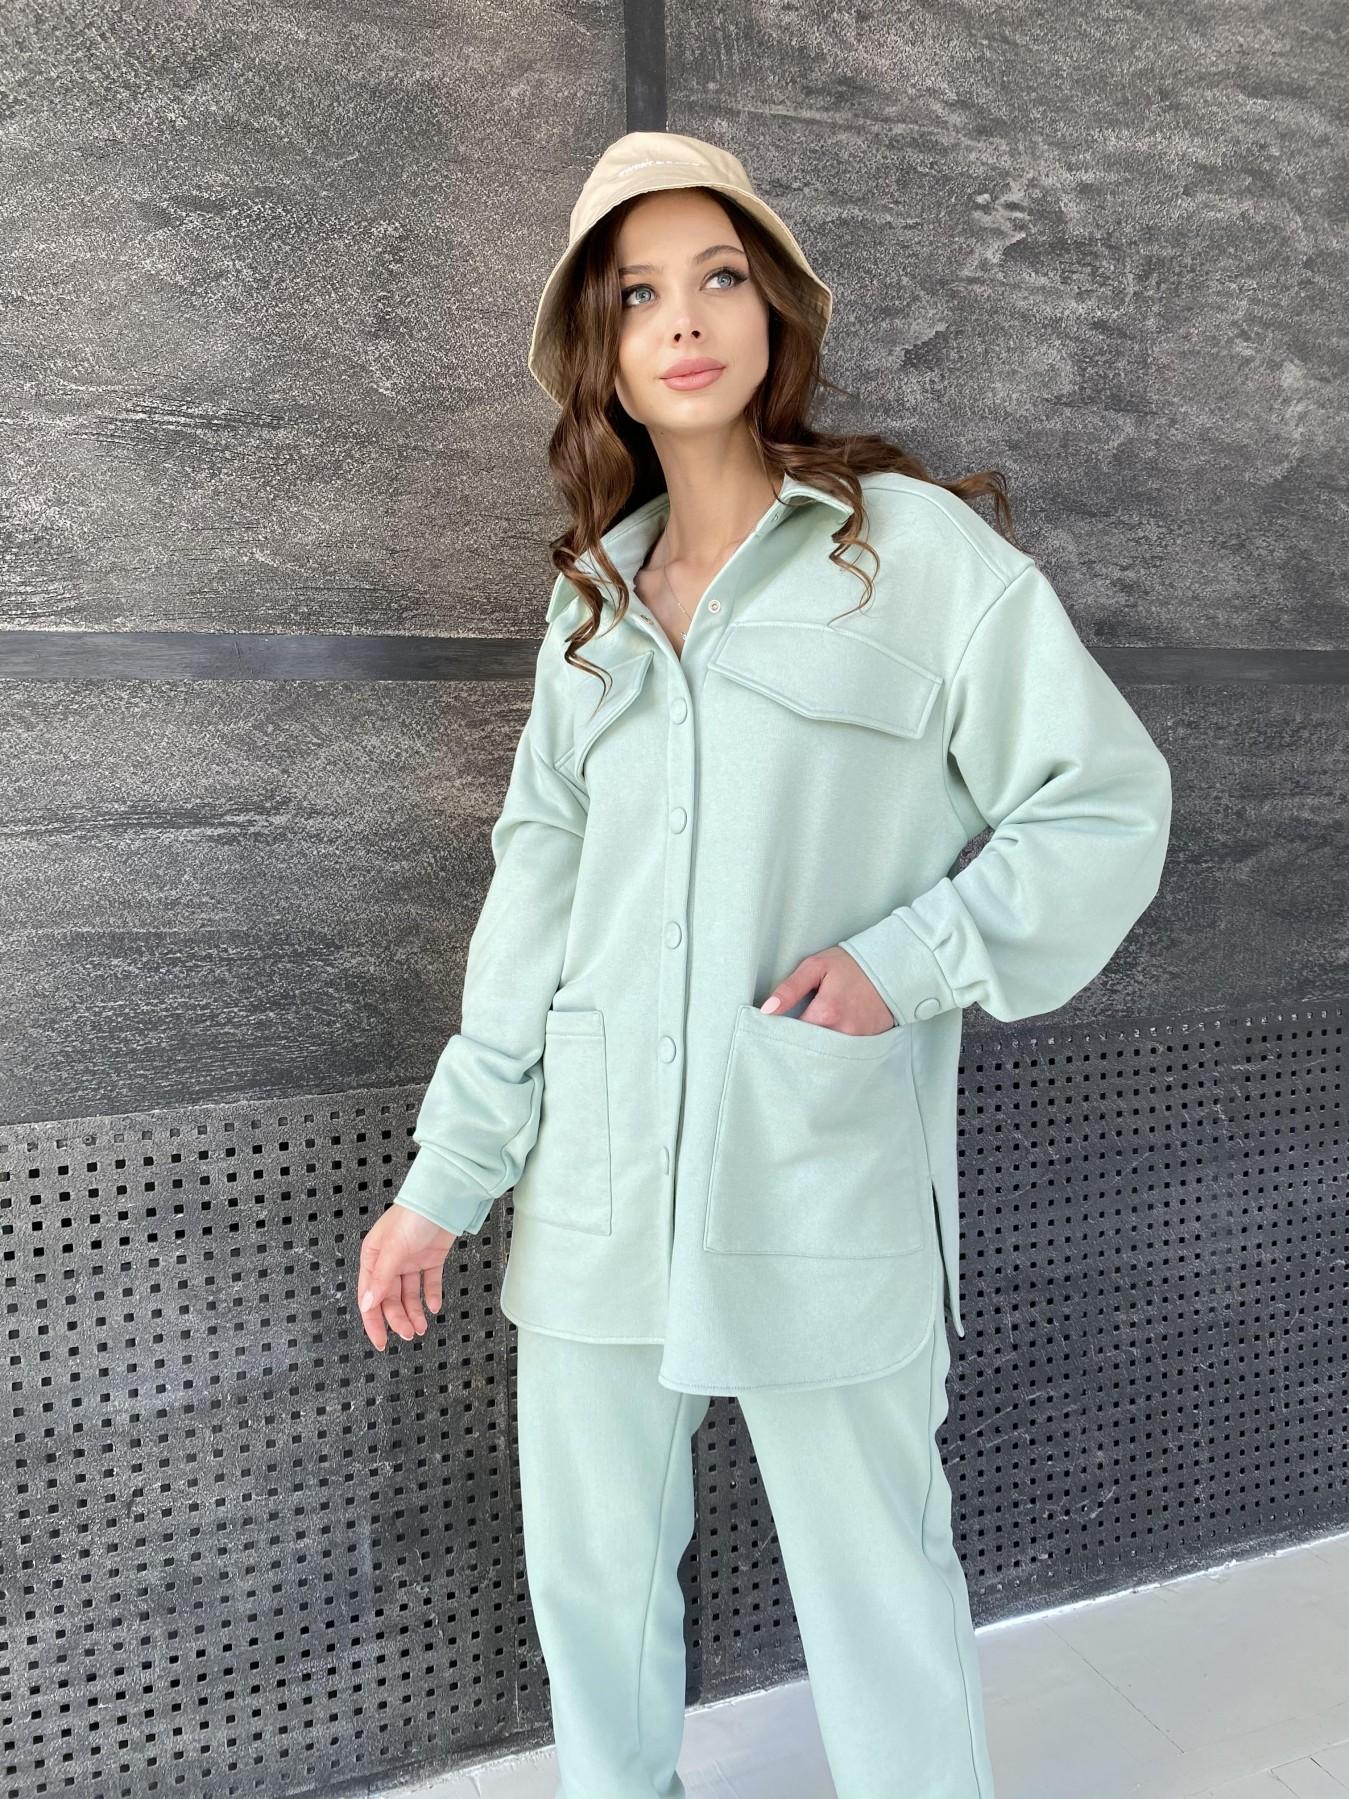 Респект костюм из трикотажа  3х нитка 11055 АРТ. 47576 Цвет: Олива Светлая - фото 8, интернет магазин tm-modus.ru